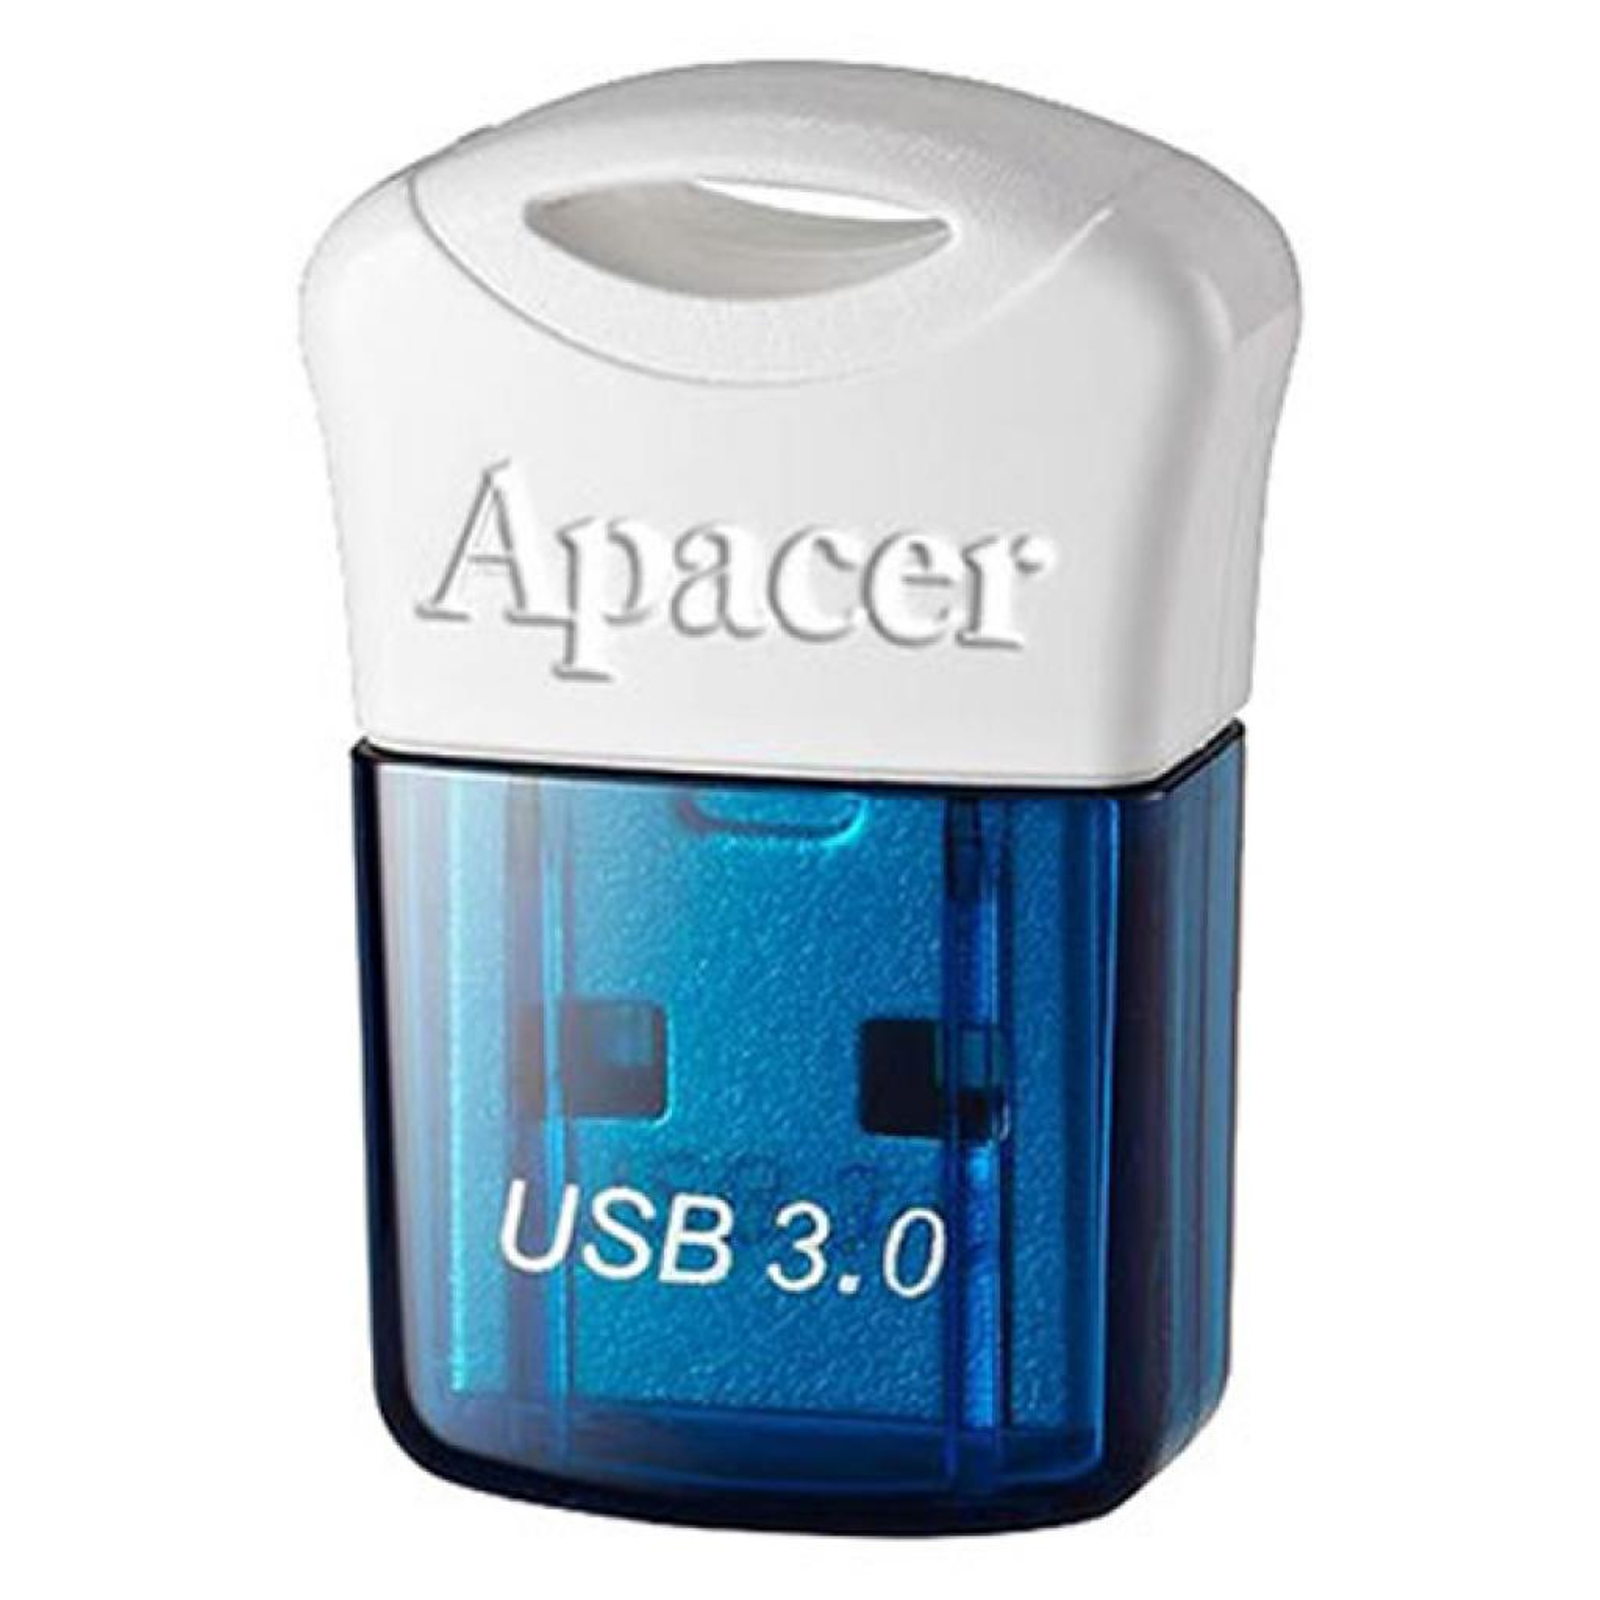 USB флеш накопитель Apacer 32GB AH157 Blue USB 3.0 (AP32GAH157U-1) изображение 2